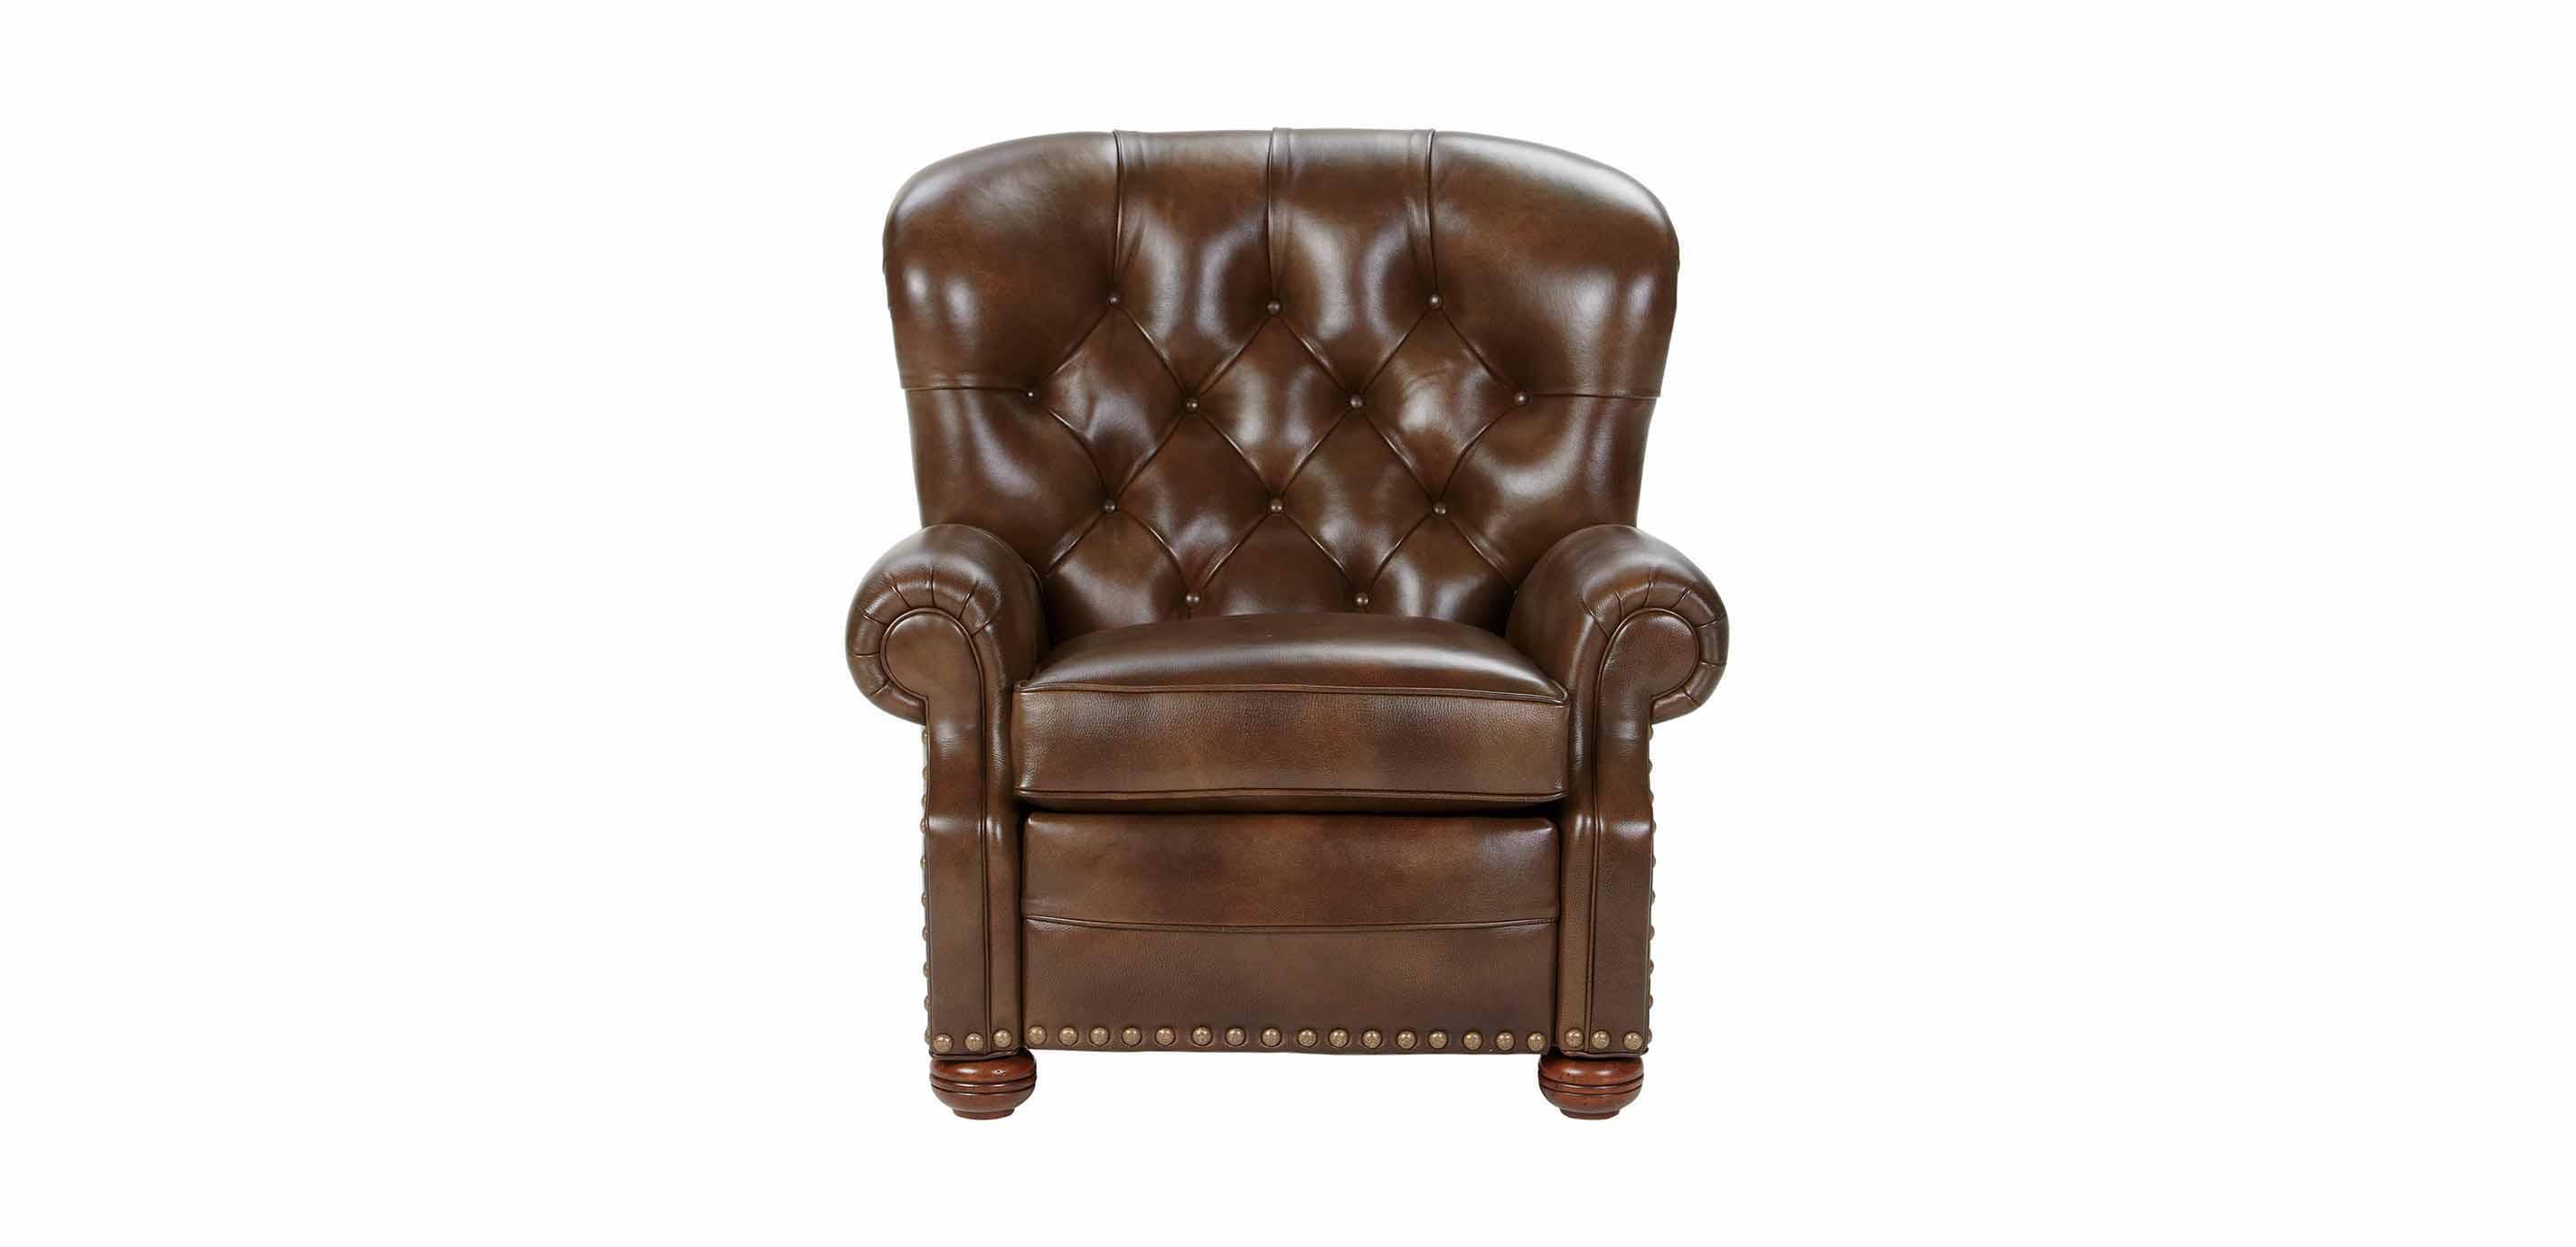 Astounding Cromwell Leather Recliner Omni Tobacco Custom Quick Ship Short Links Chair Design For Home Short Linksinfo